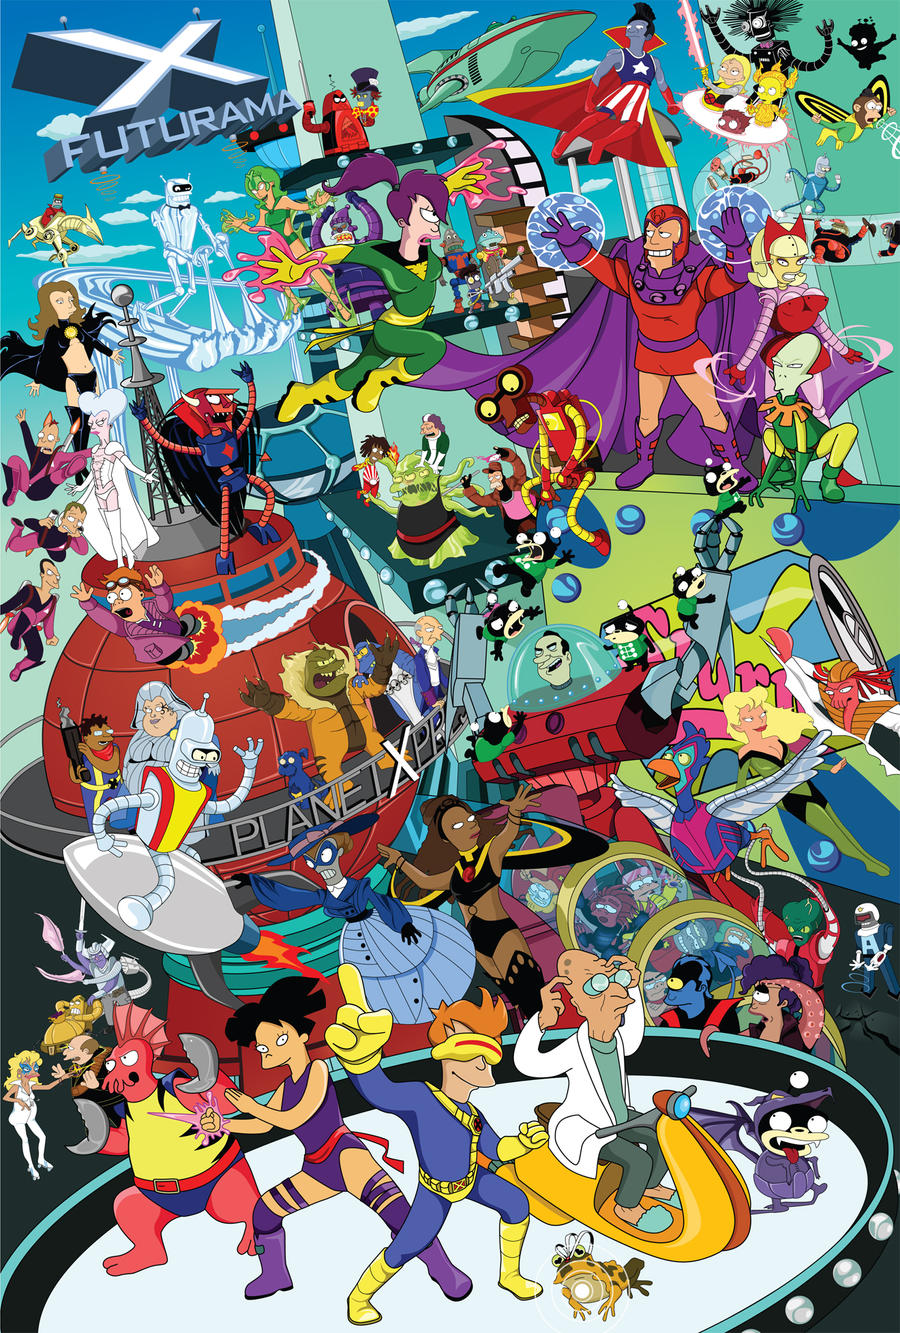 Futurama_X_Men_Meld_by_gottabecarl.jpg